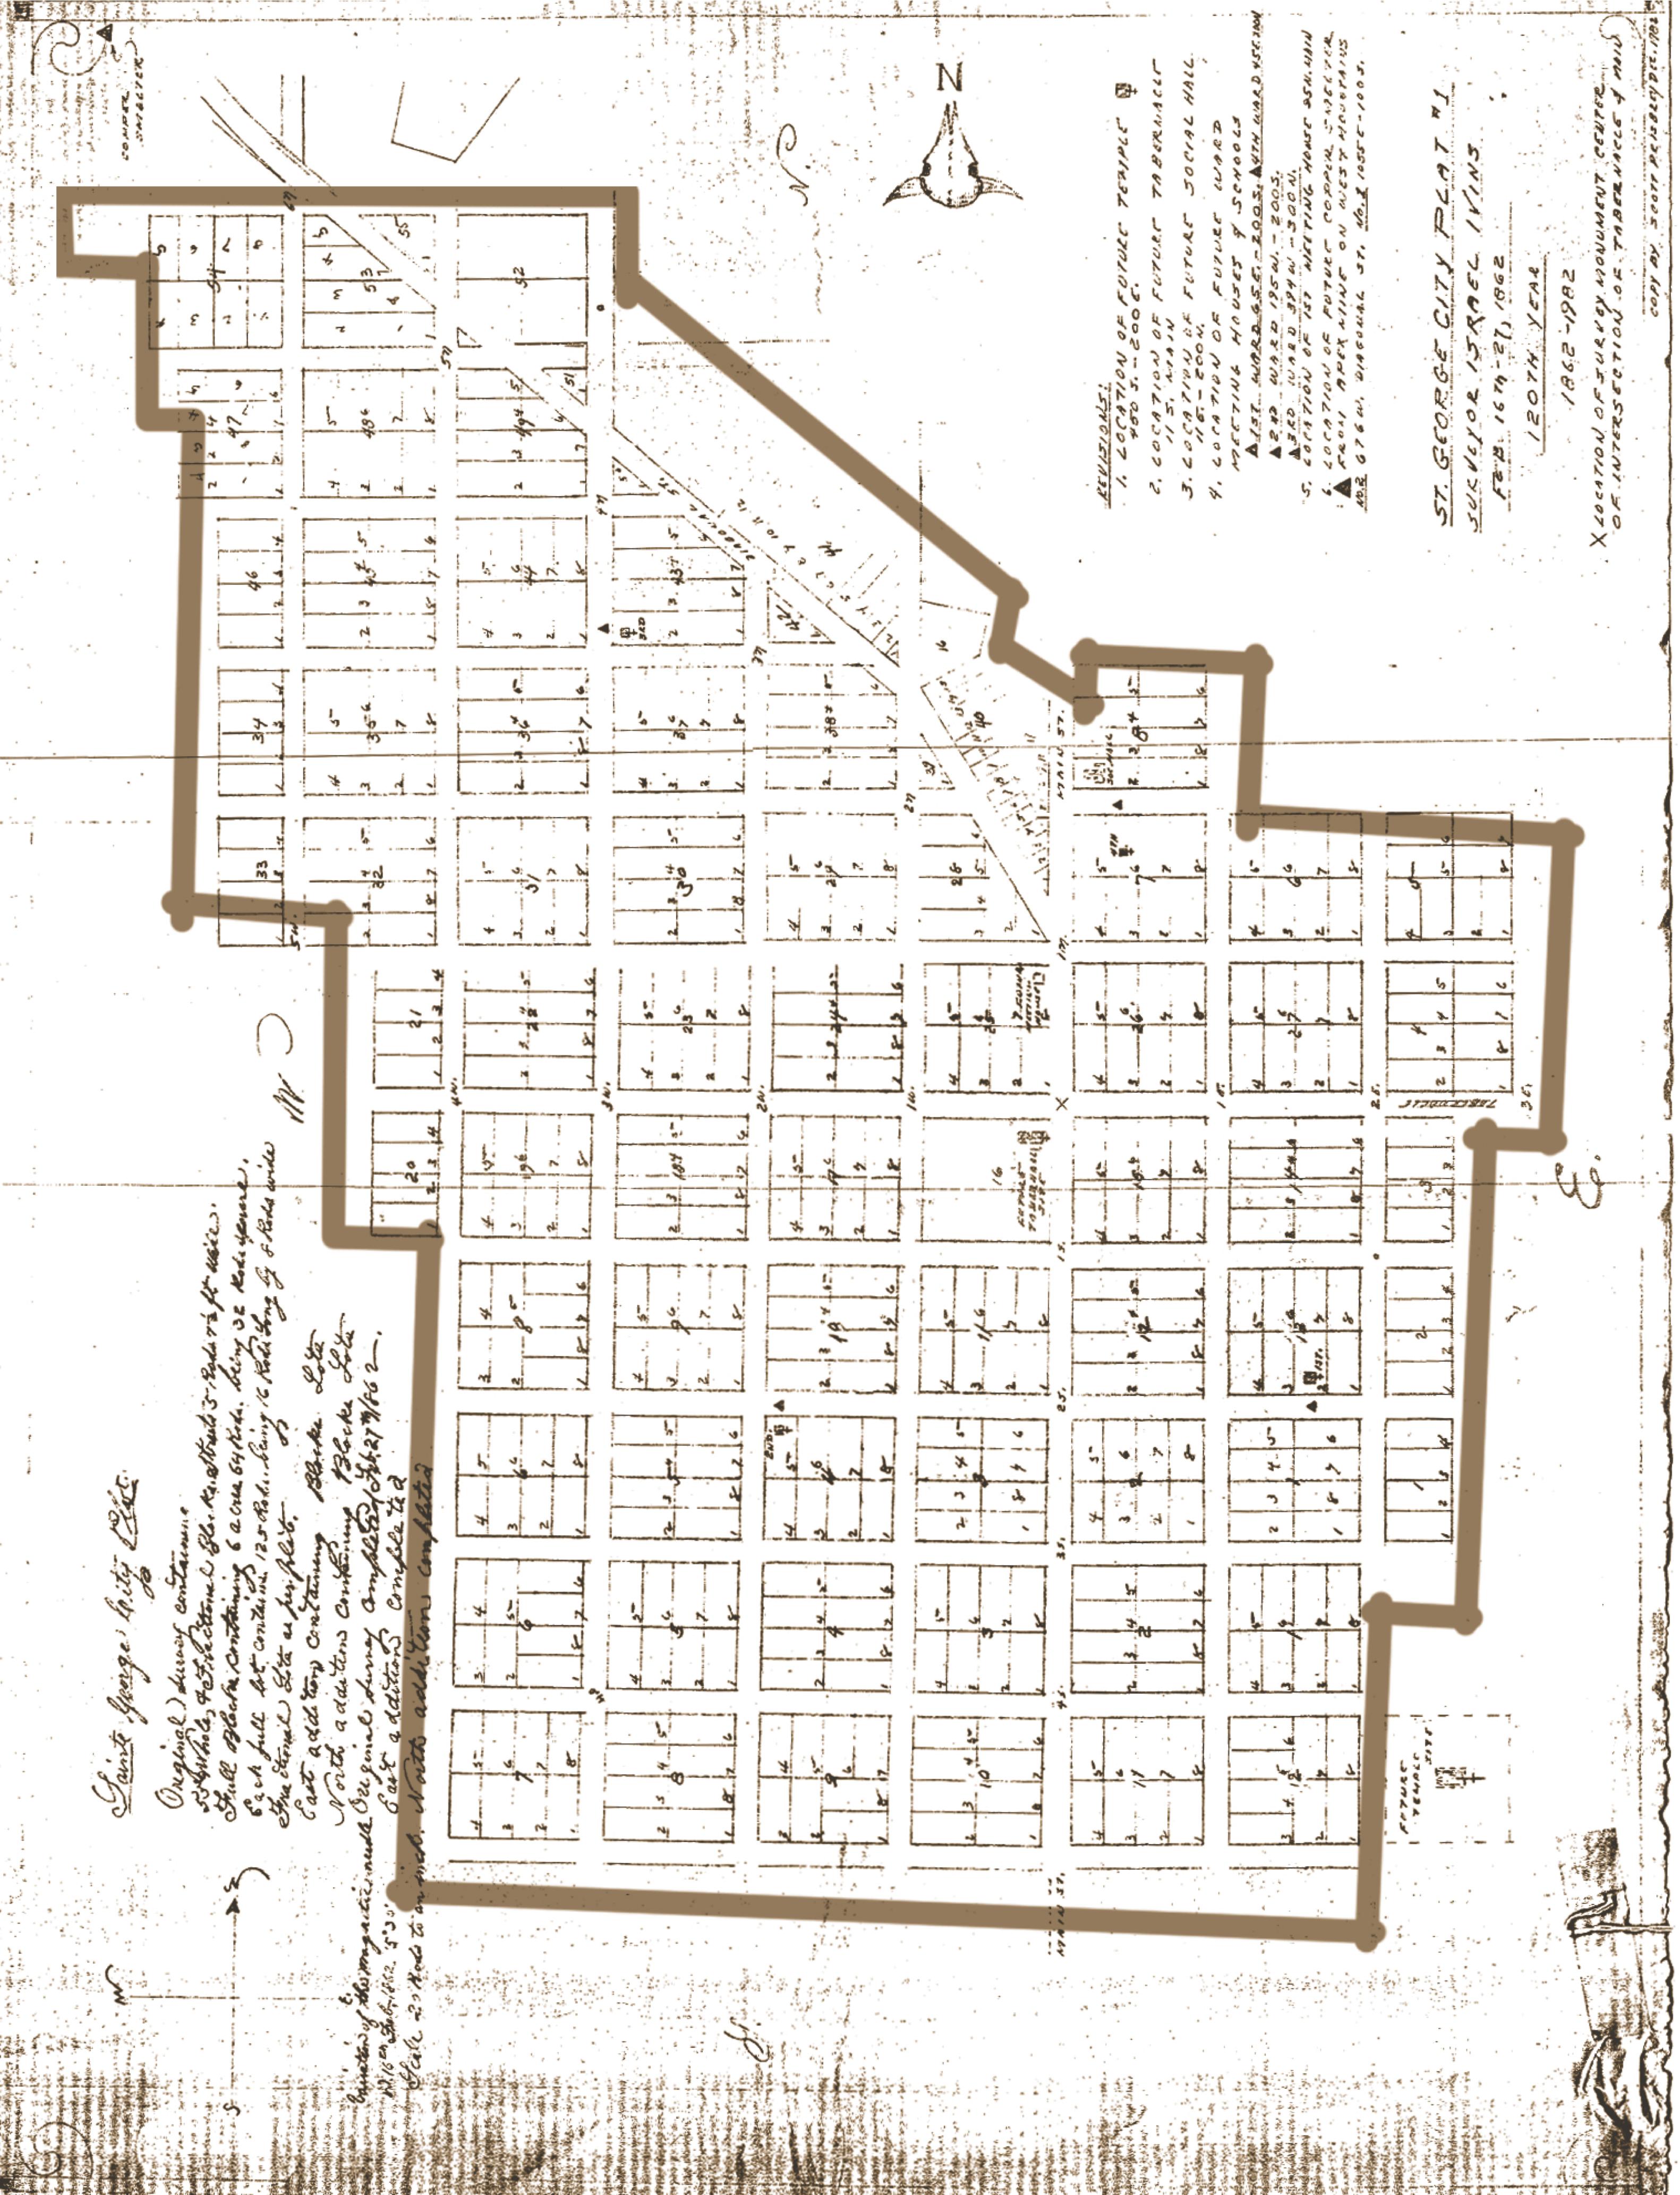 Rancho Bernardo High School Campus Map.Washington County Maps And Charts